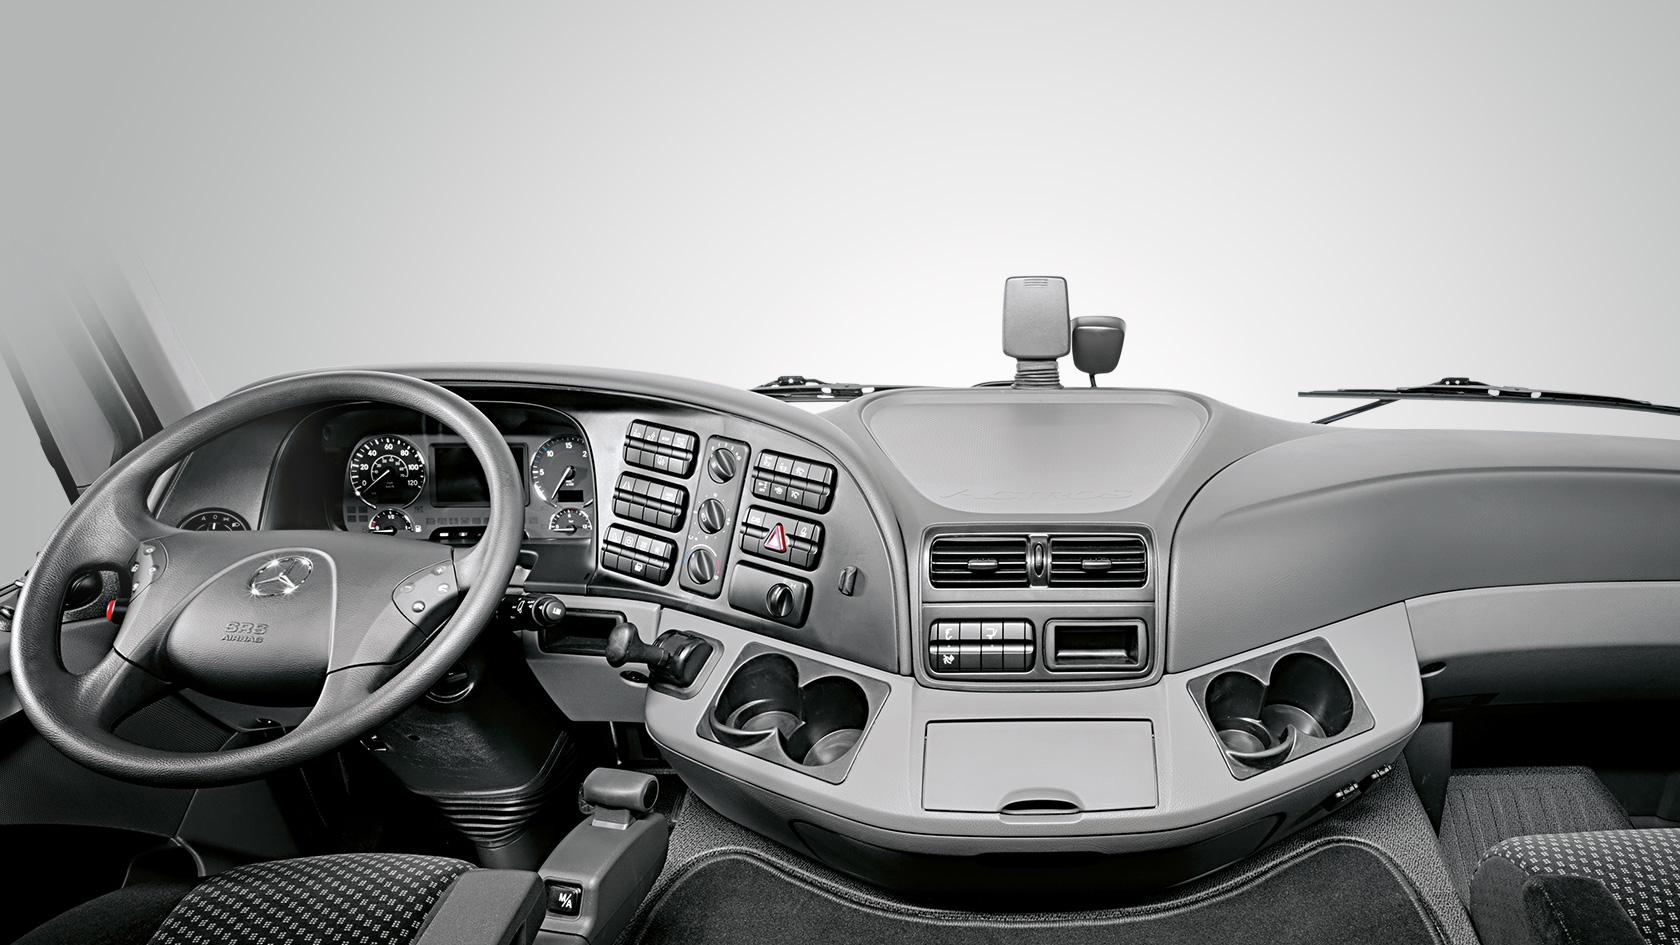 actros interior mercedes benz trucks trucks you can trust. Black Bedroom Furniture Sets. Home Design Ideas